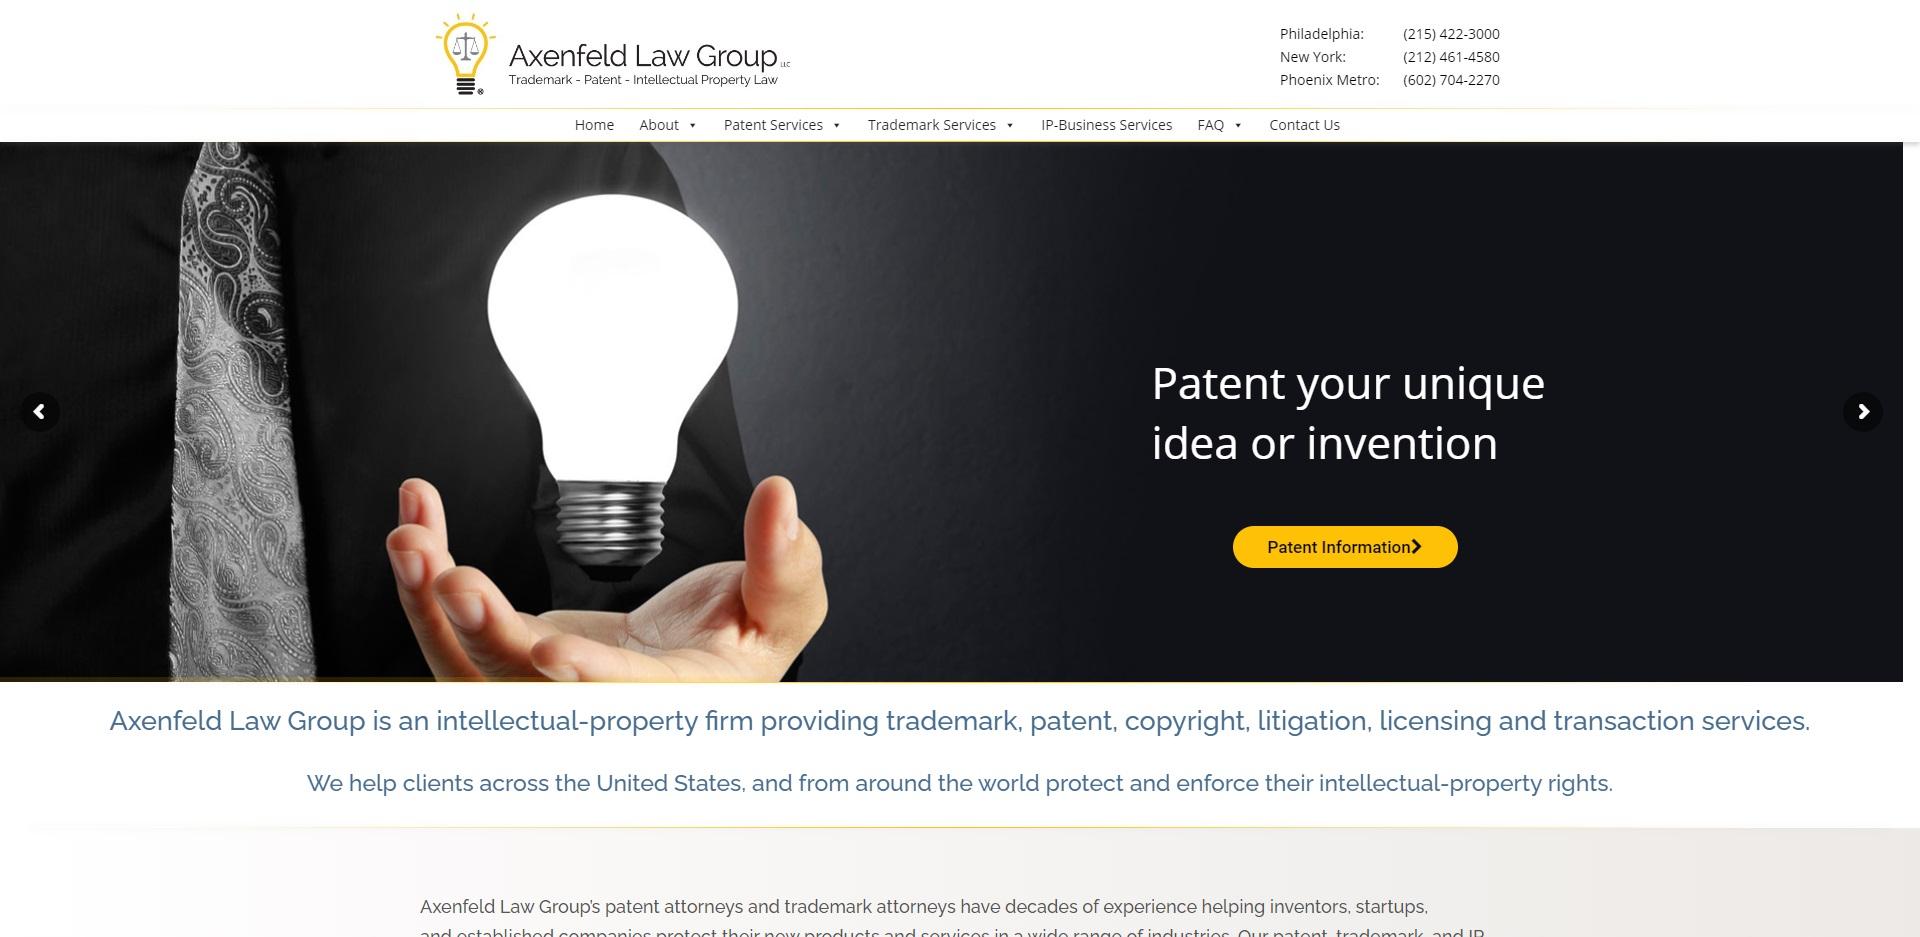 Best Patent Attorneys in Philadelphia